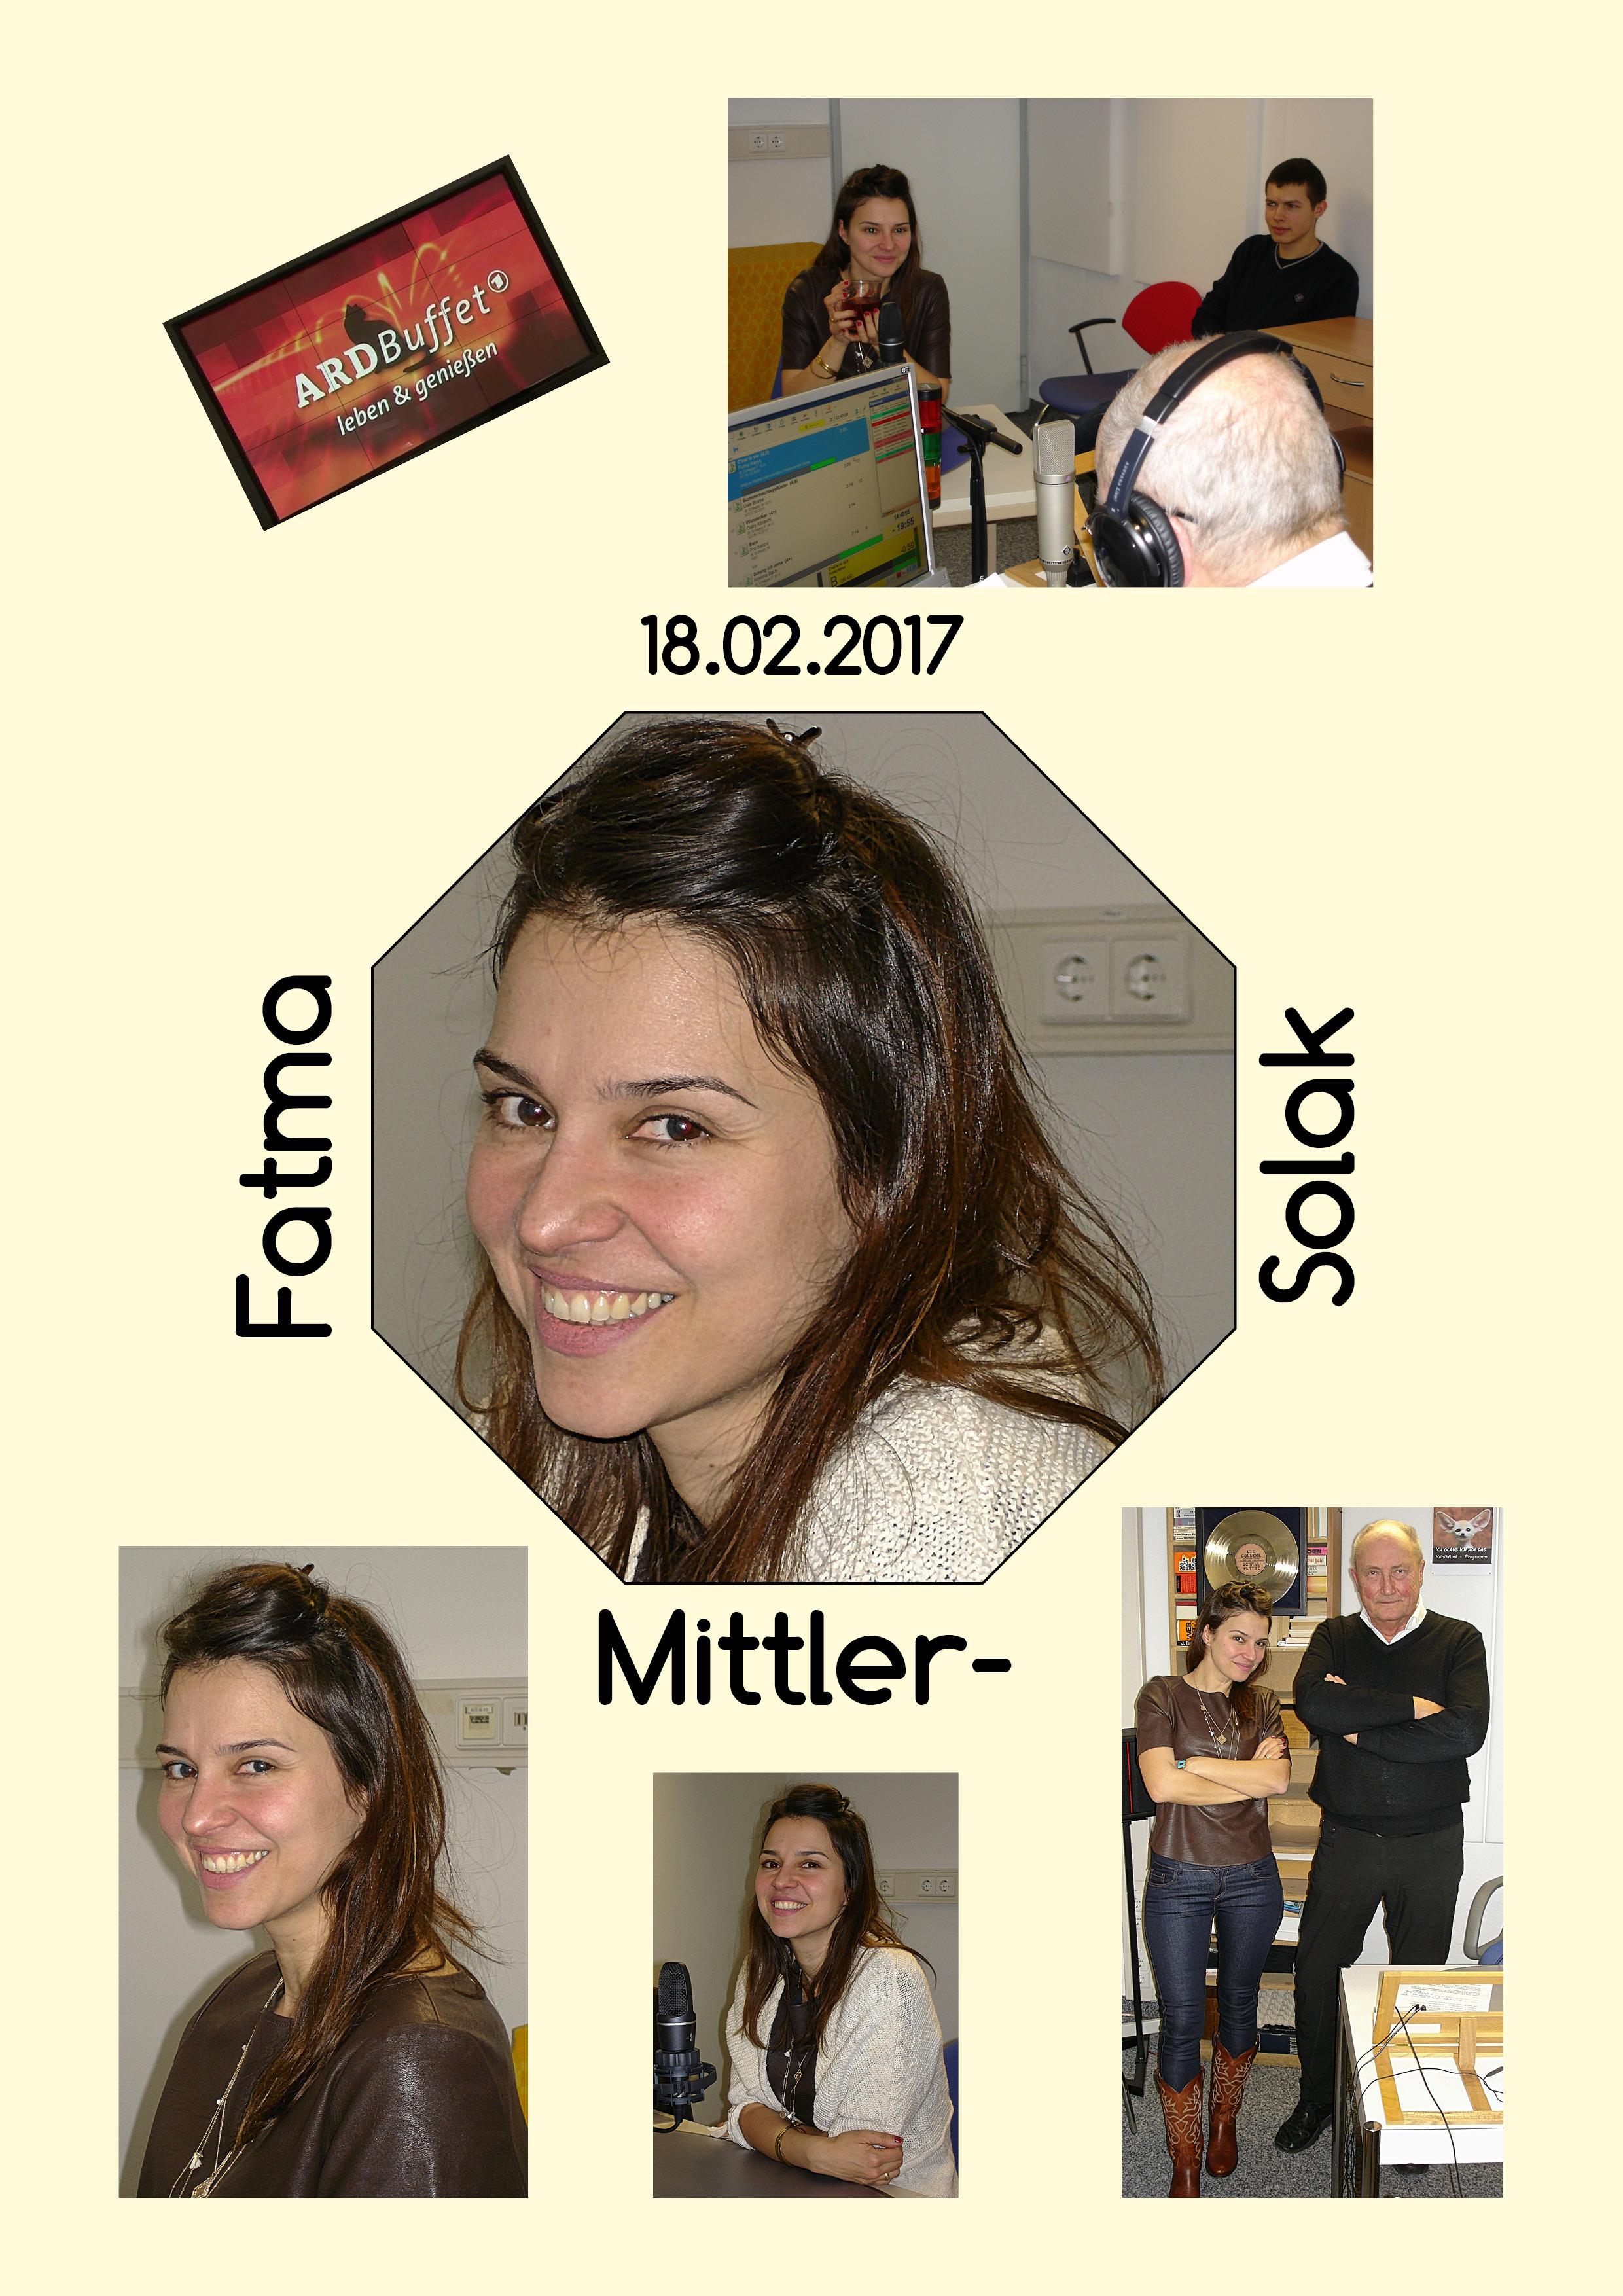 18.02 Fatma Mittler-Solak